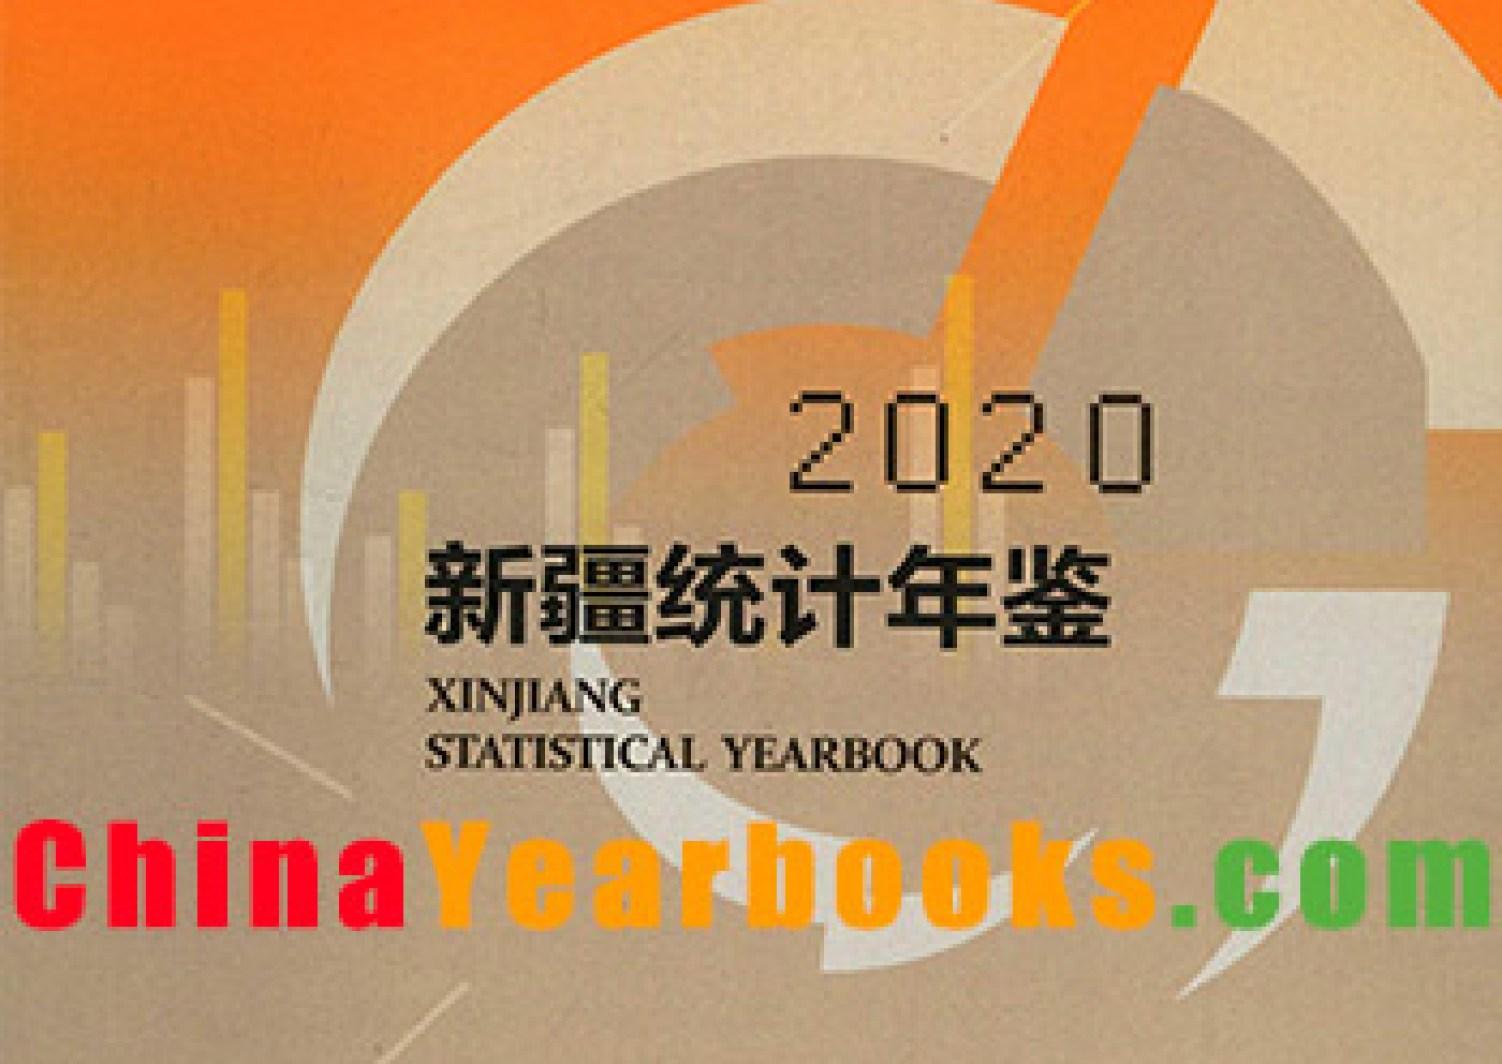 Xinjiang Statistical Yearbook China Yearbooks